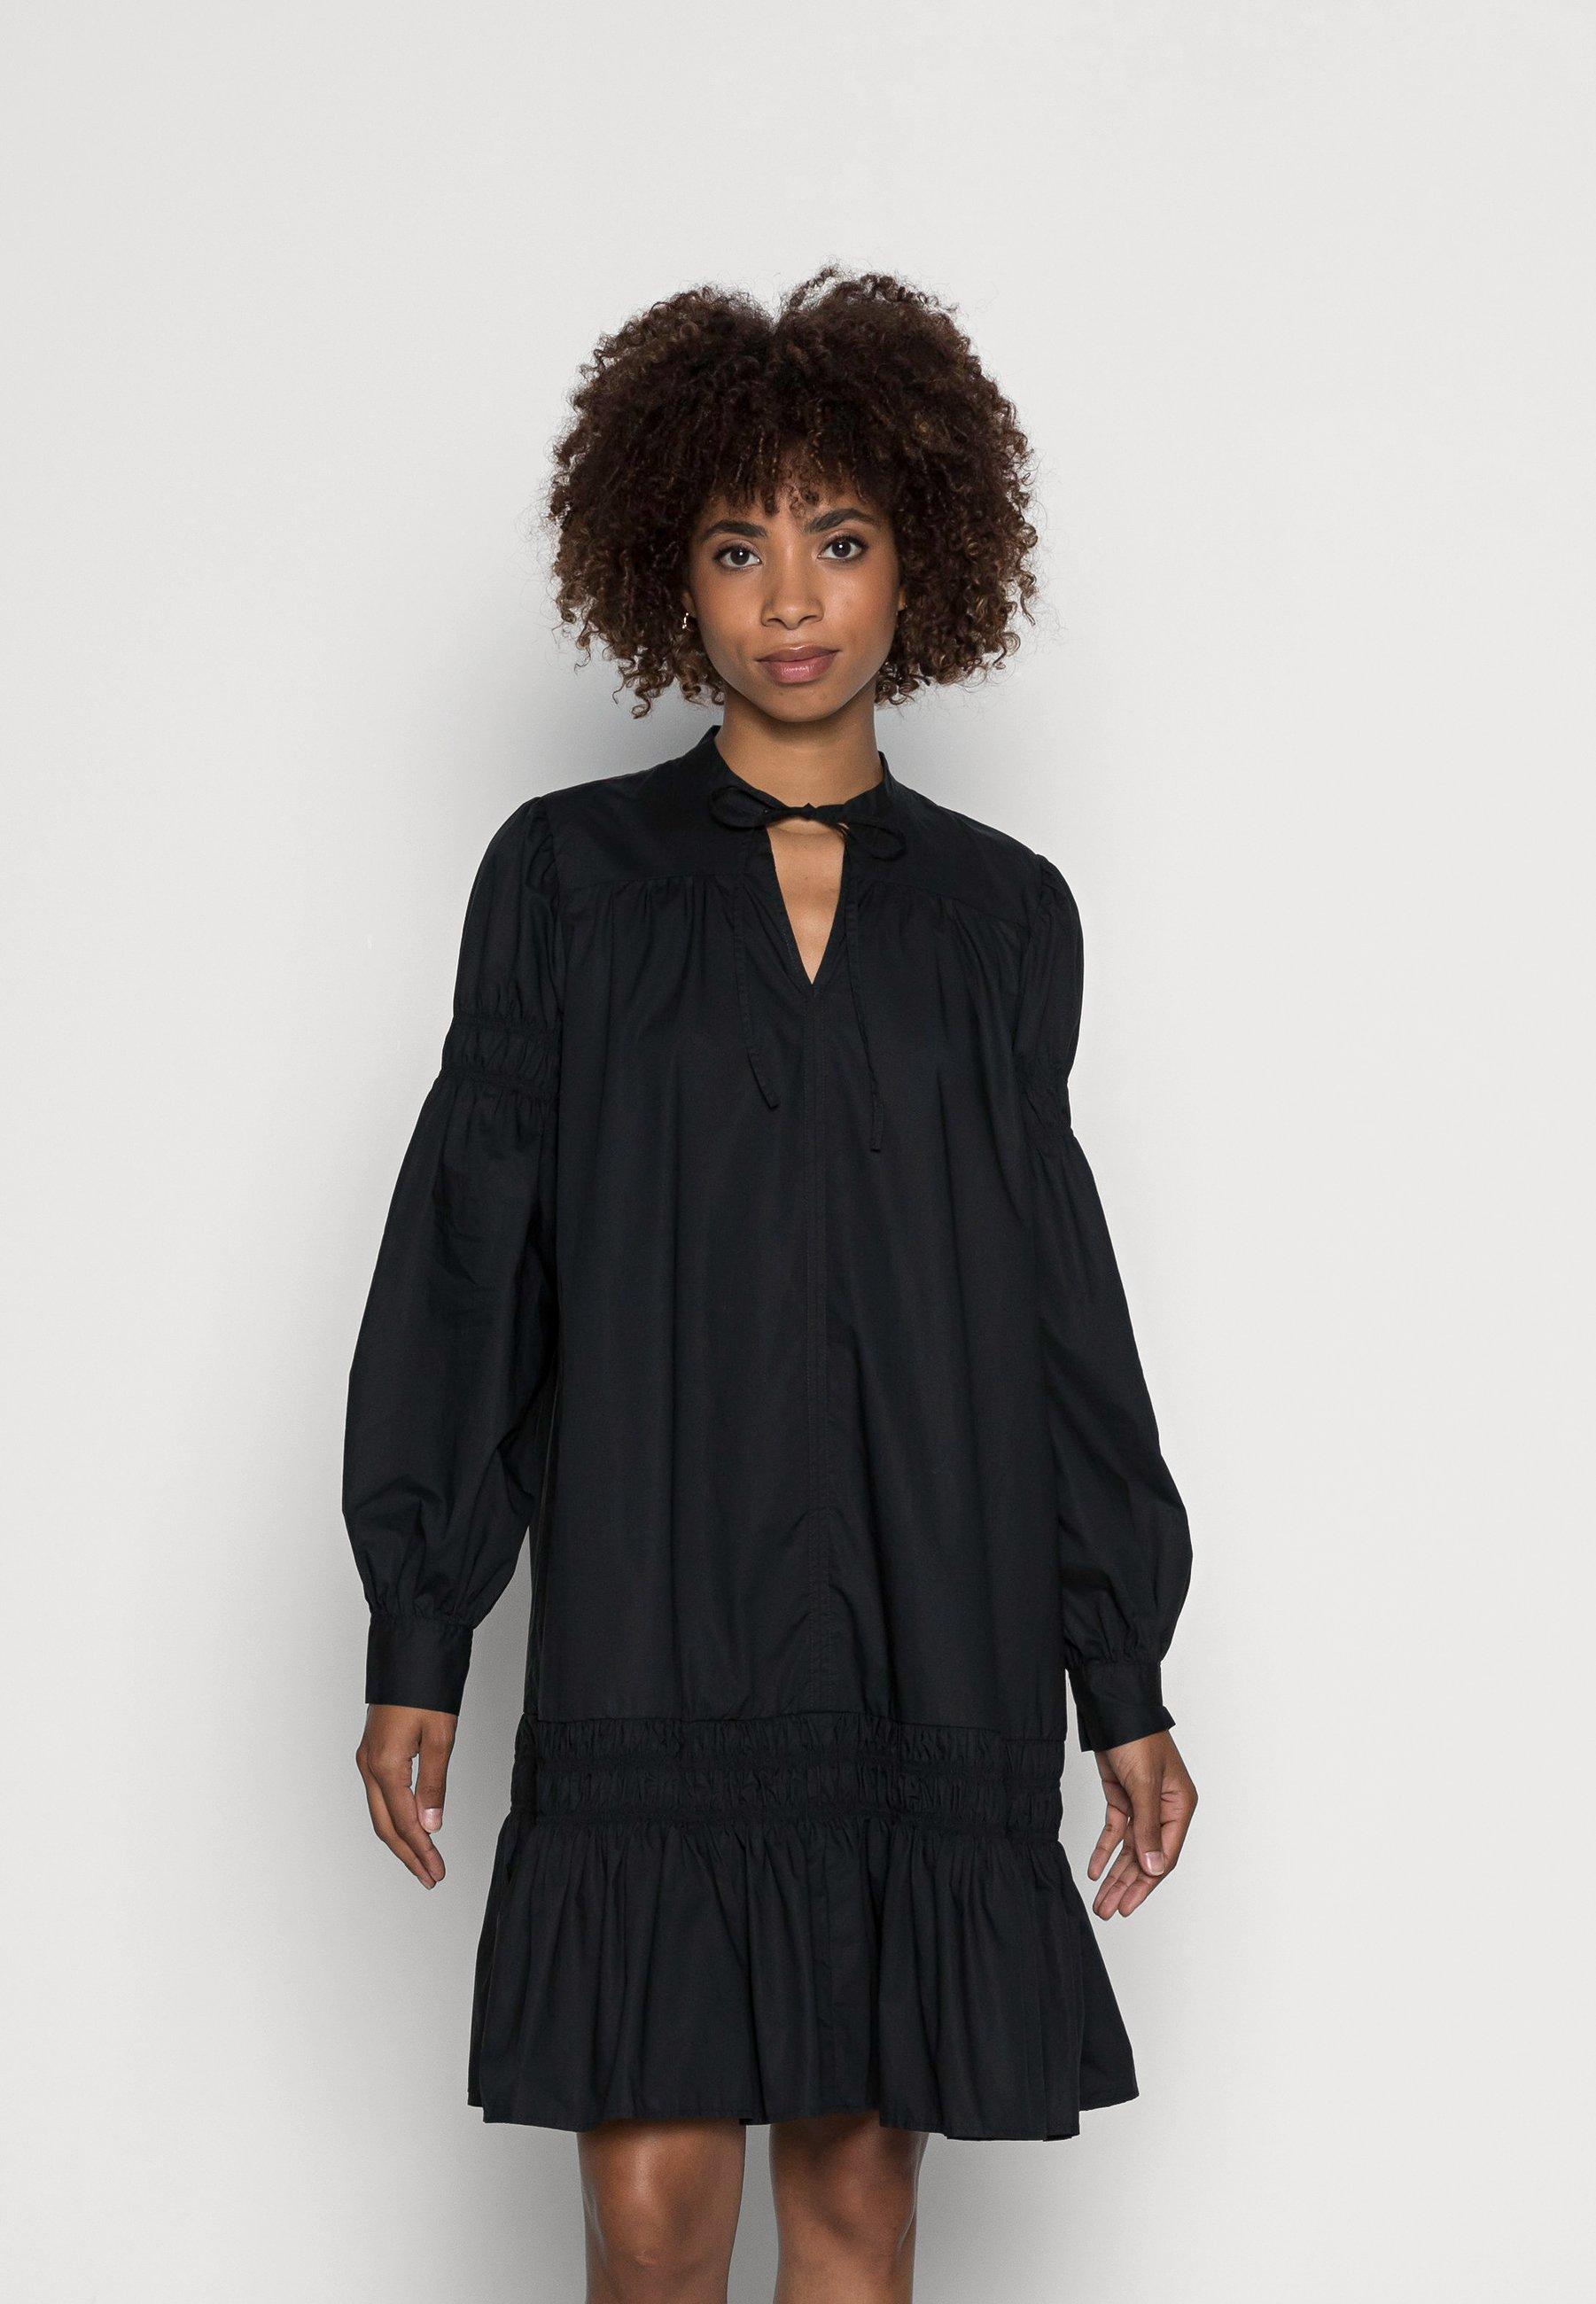 Women DRESS SMOCK DETAILS AT SLEEVE AND SKIRT LONGSLEEVE - Day dress